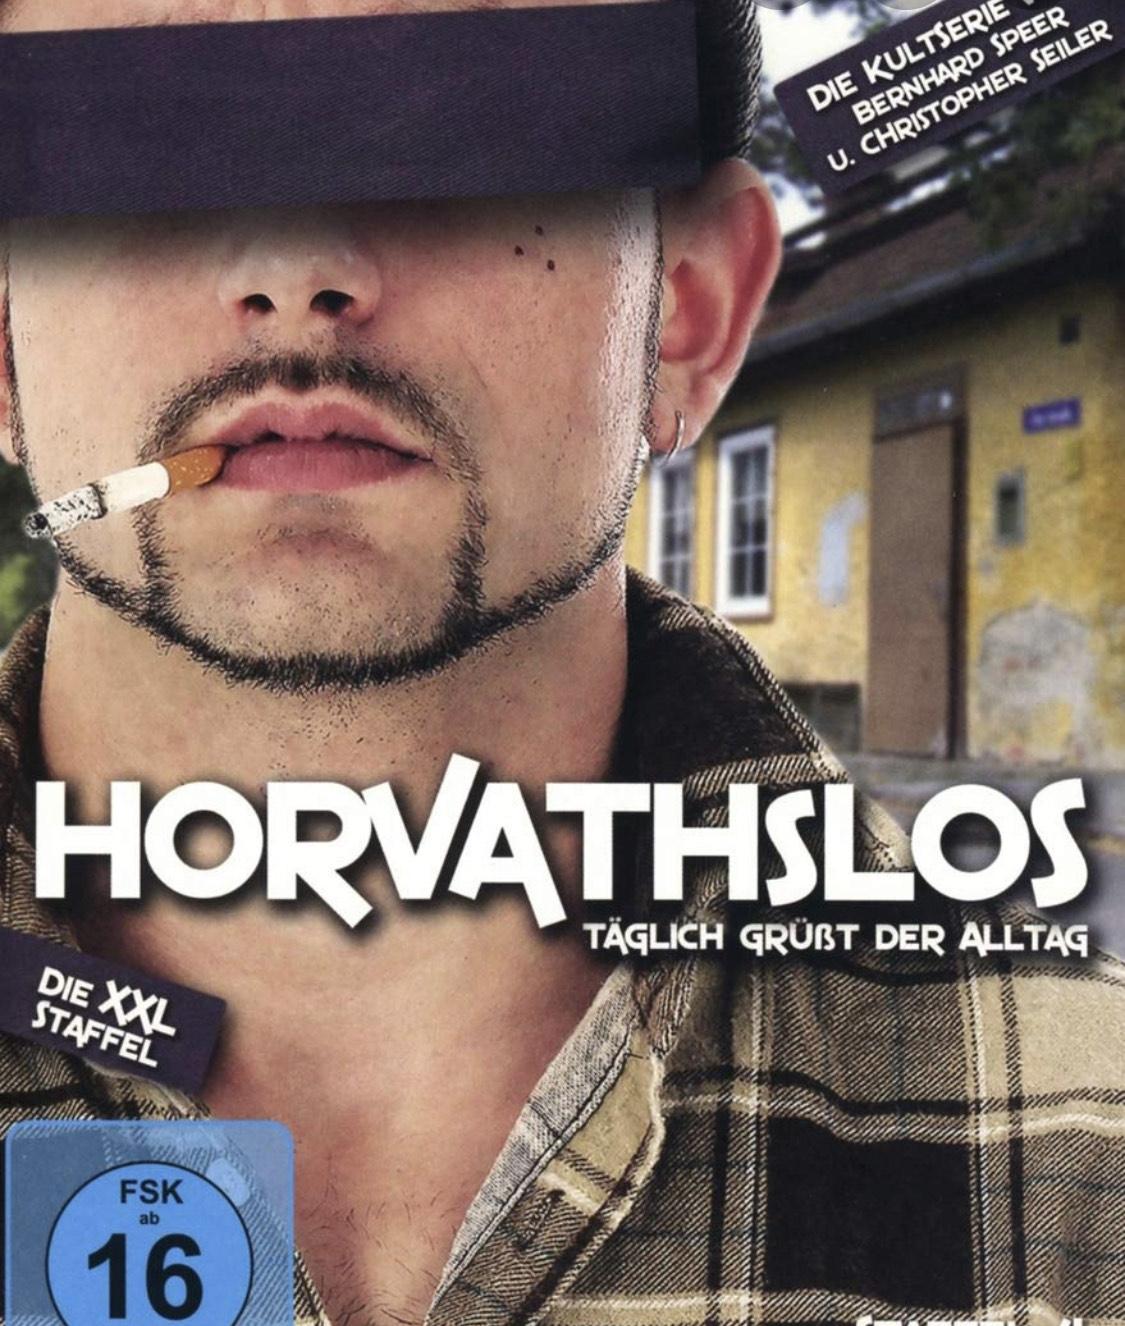 Horvathslos Staffel 1-3 online streamen kostenlos